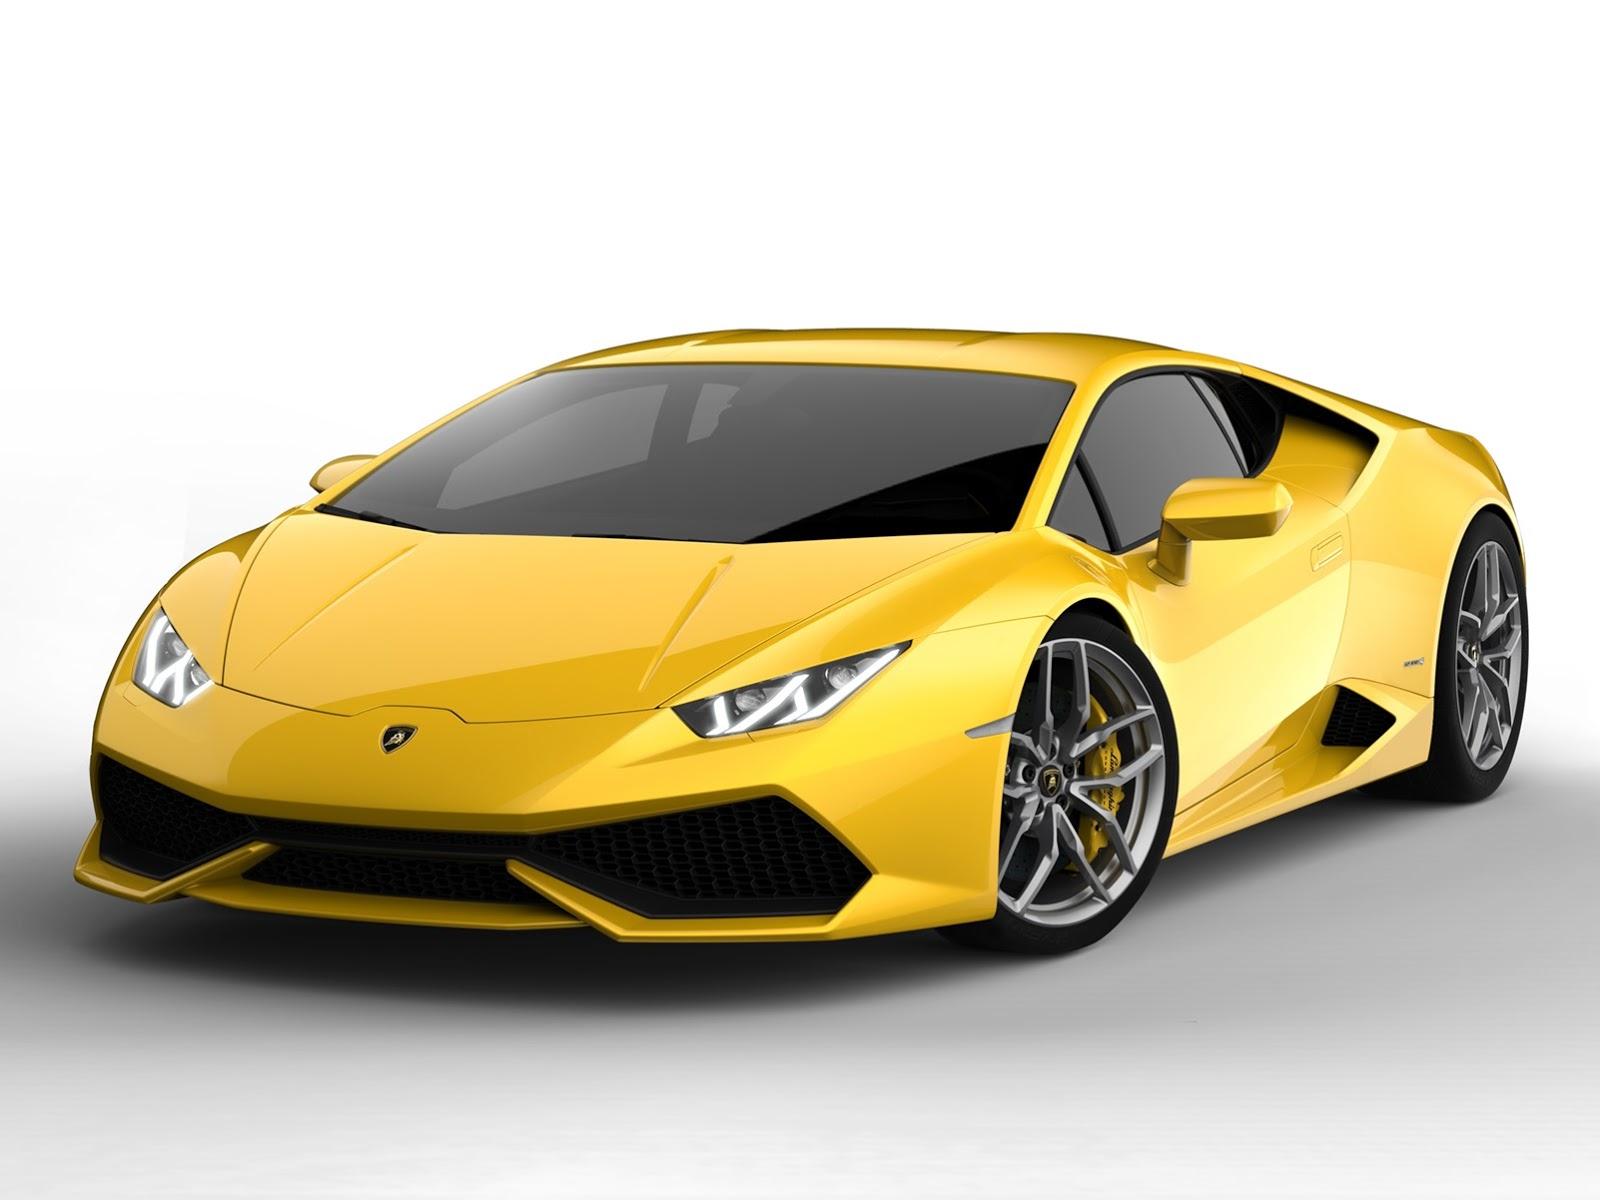 New-Lamborghini-Huracan-LP-610-4-pics (1)